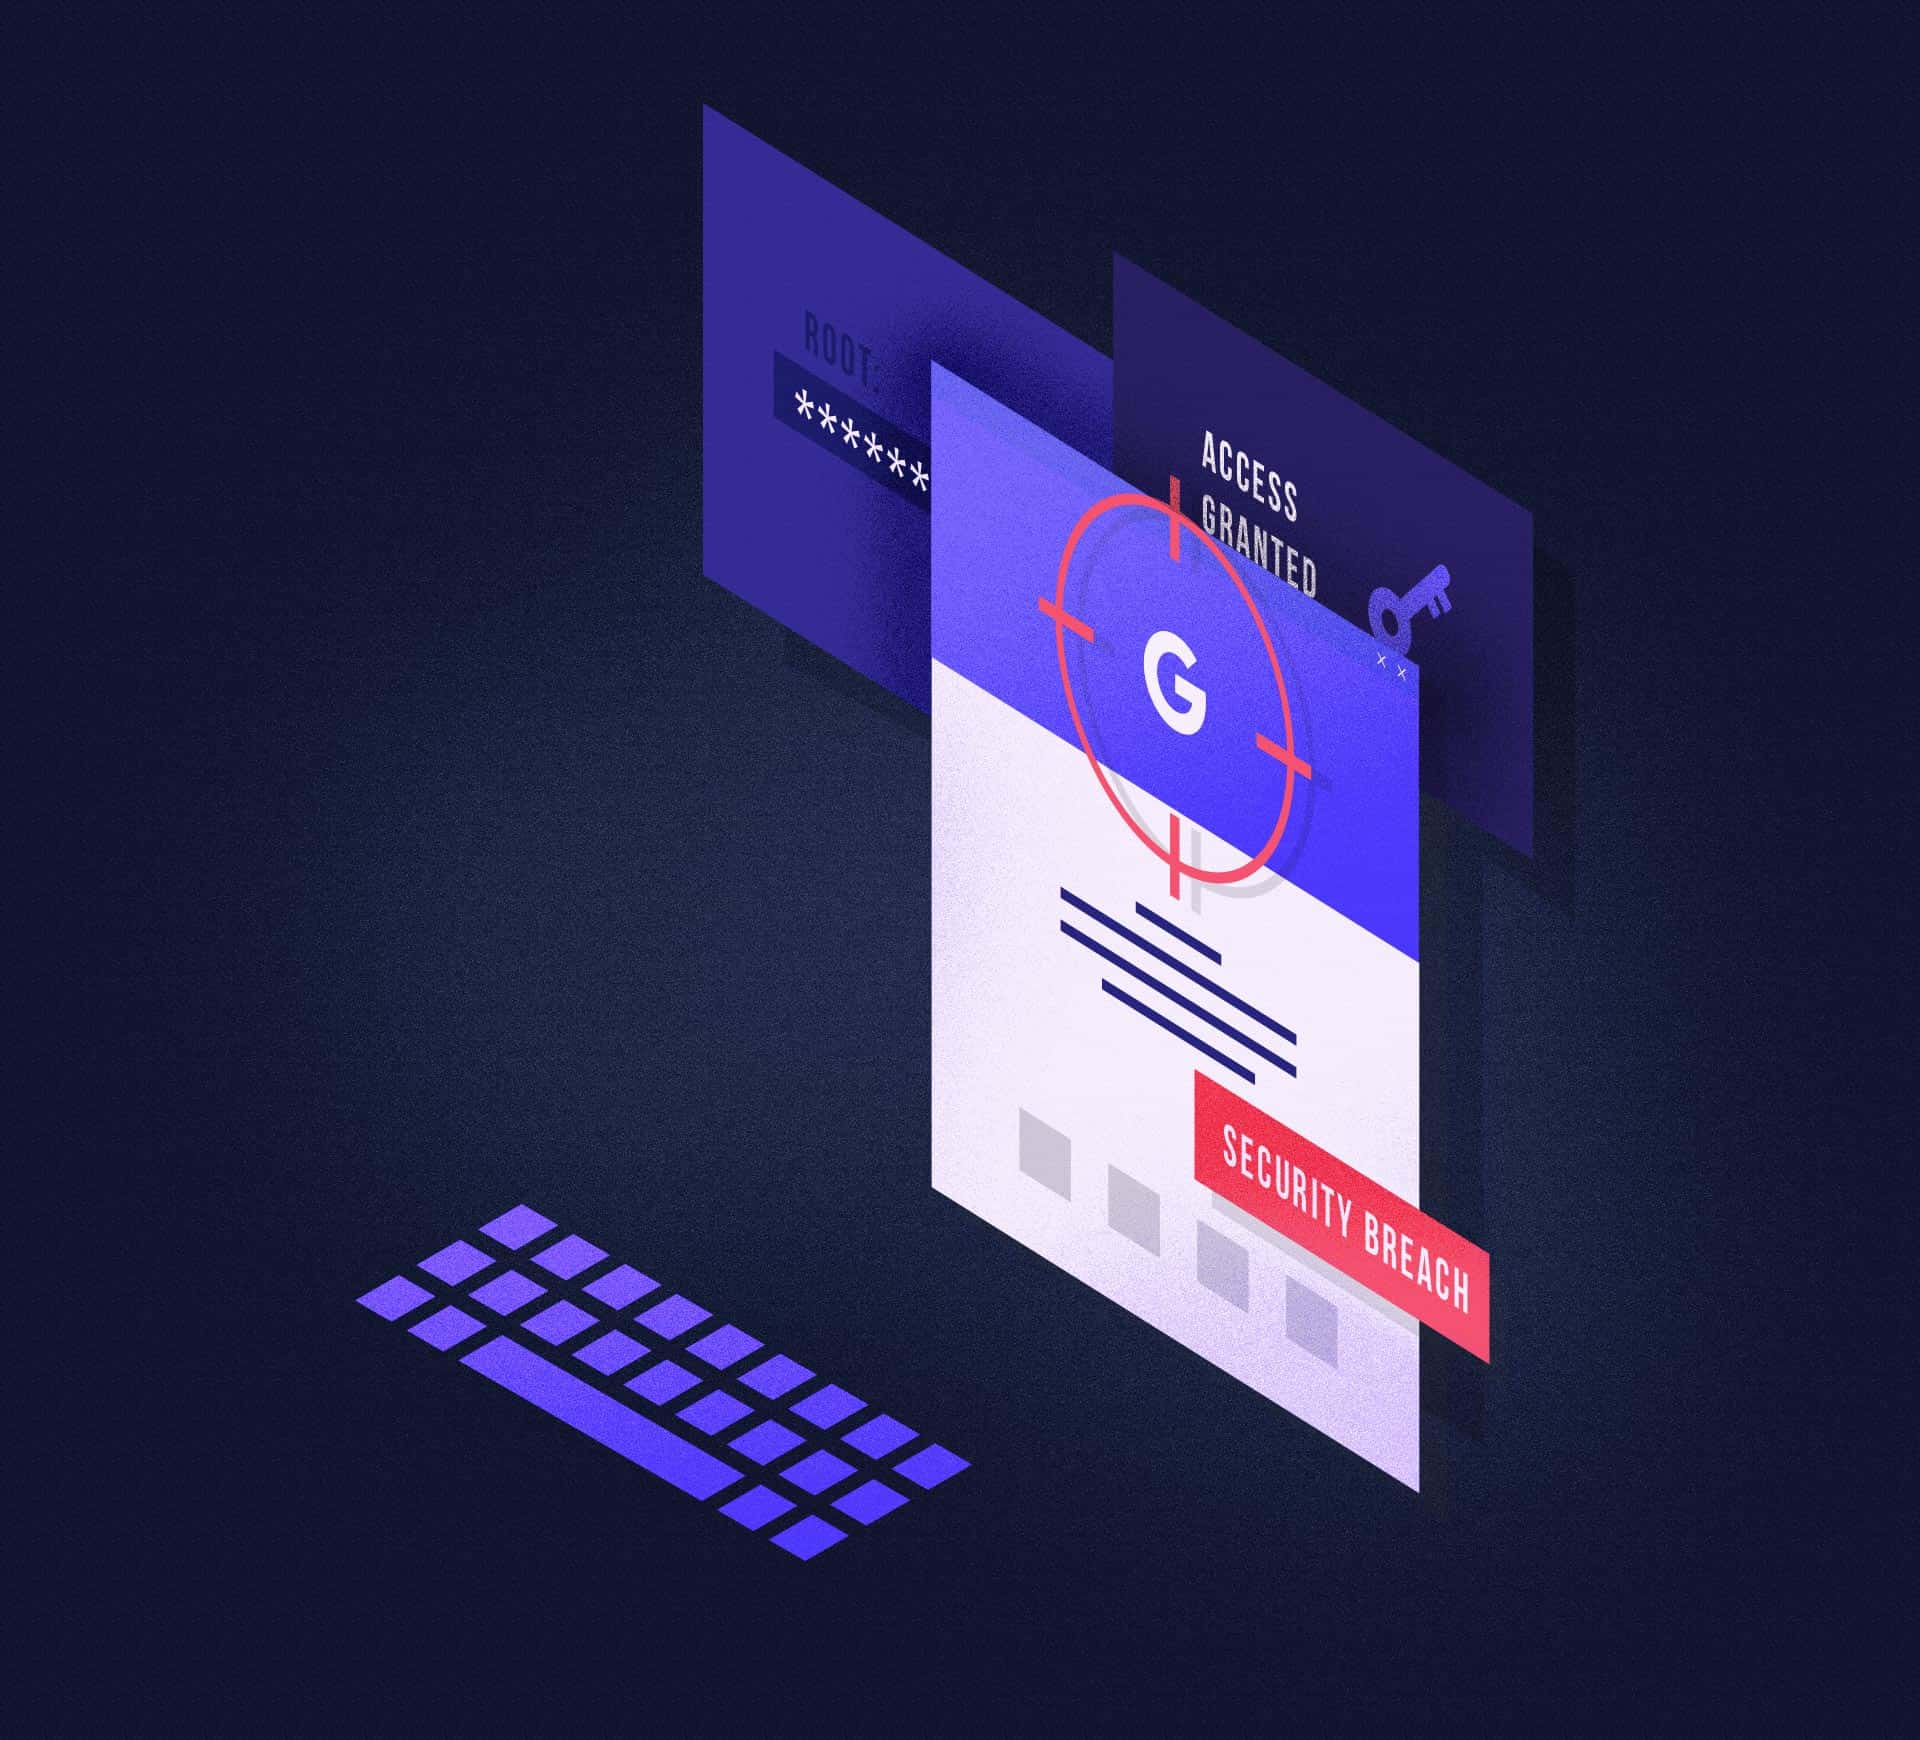 Hackuty Google